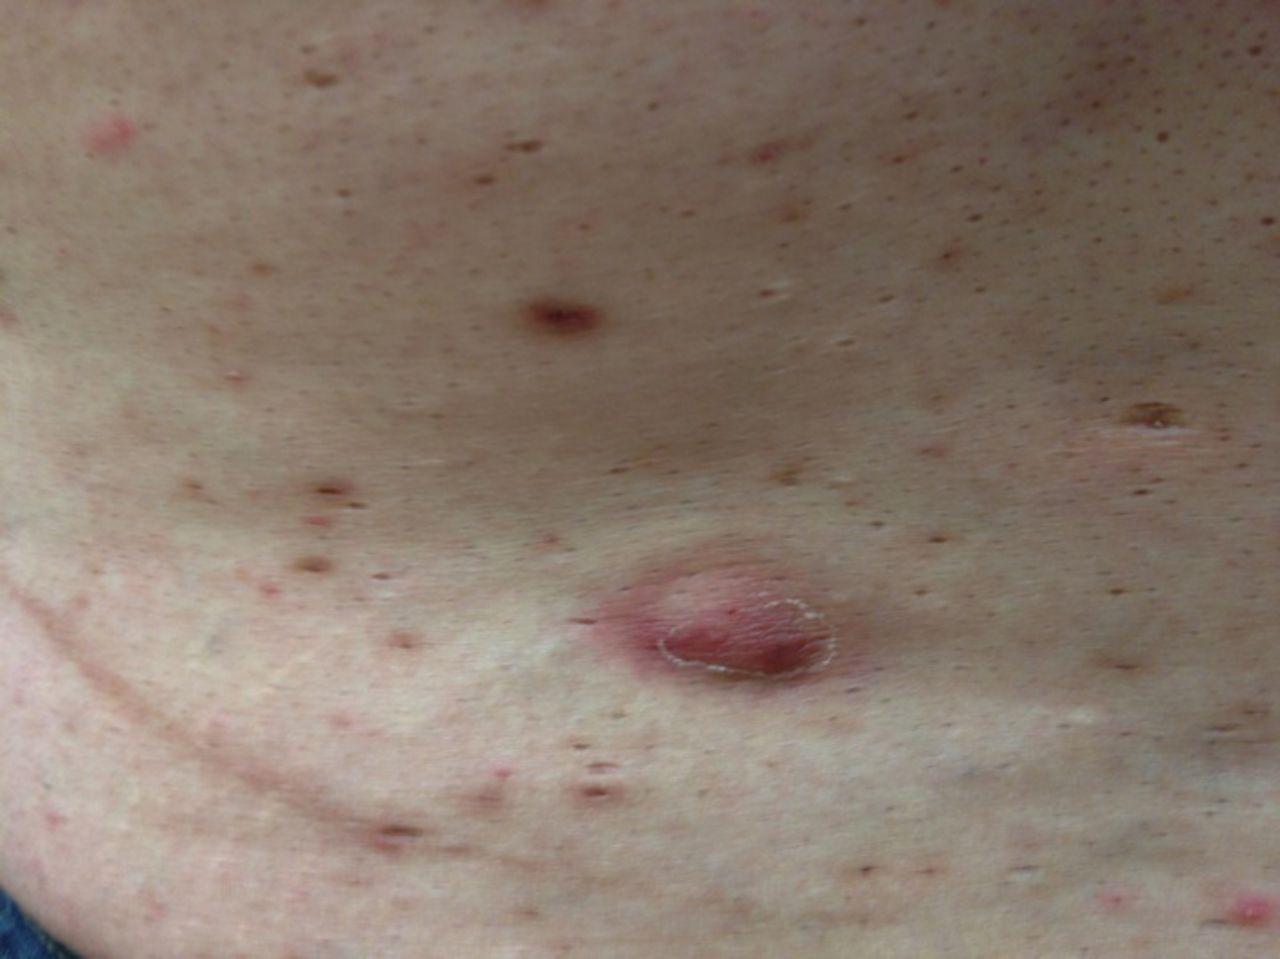 diagnosis and management of hidradenitis suppurativa | the bmj